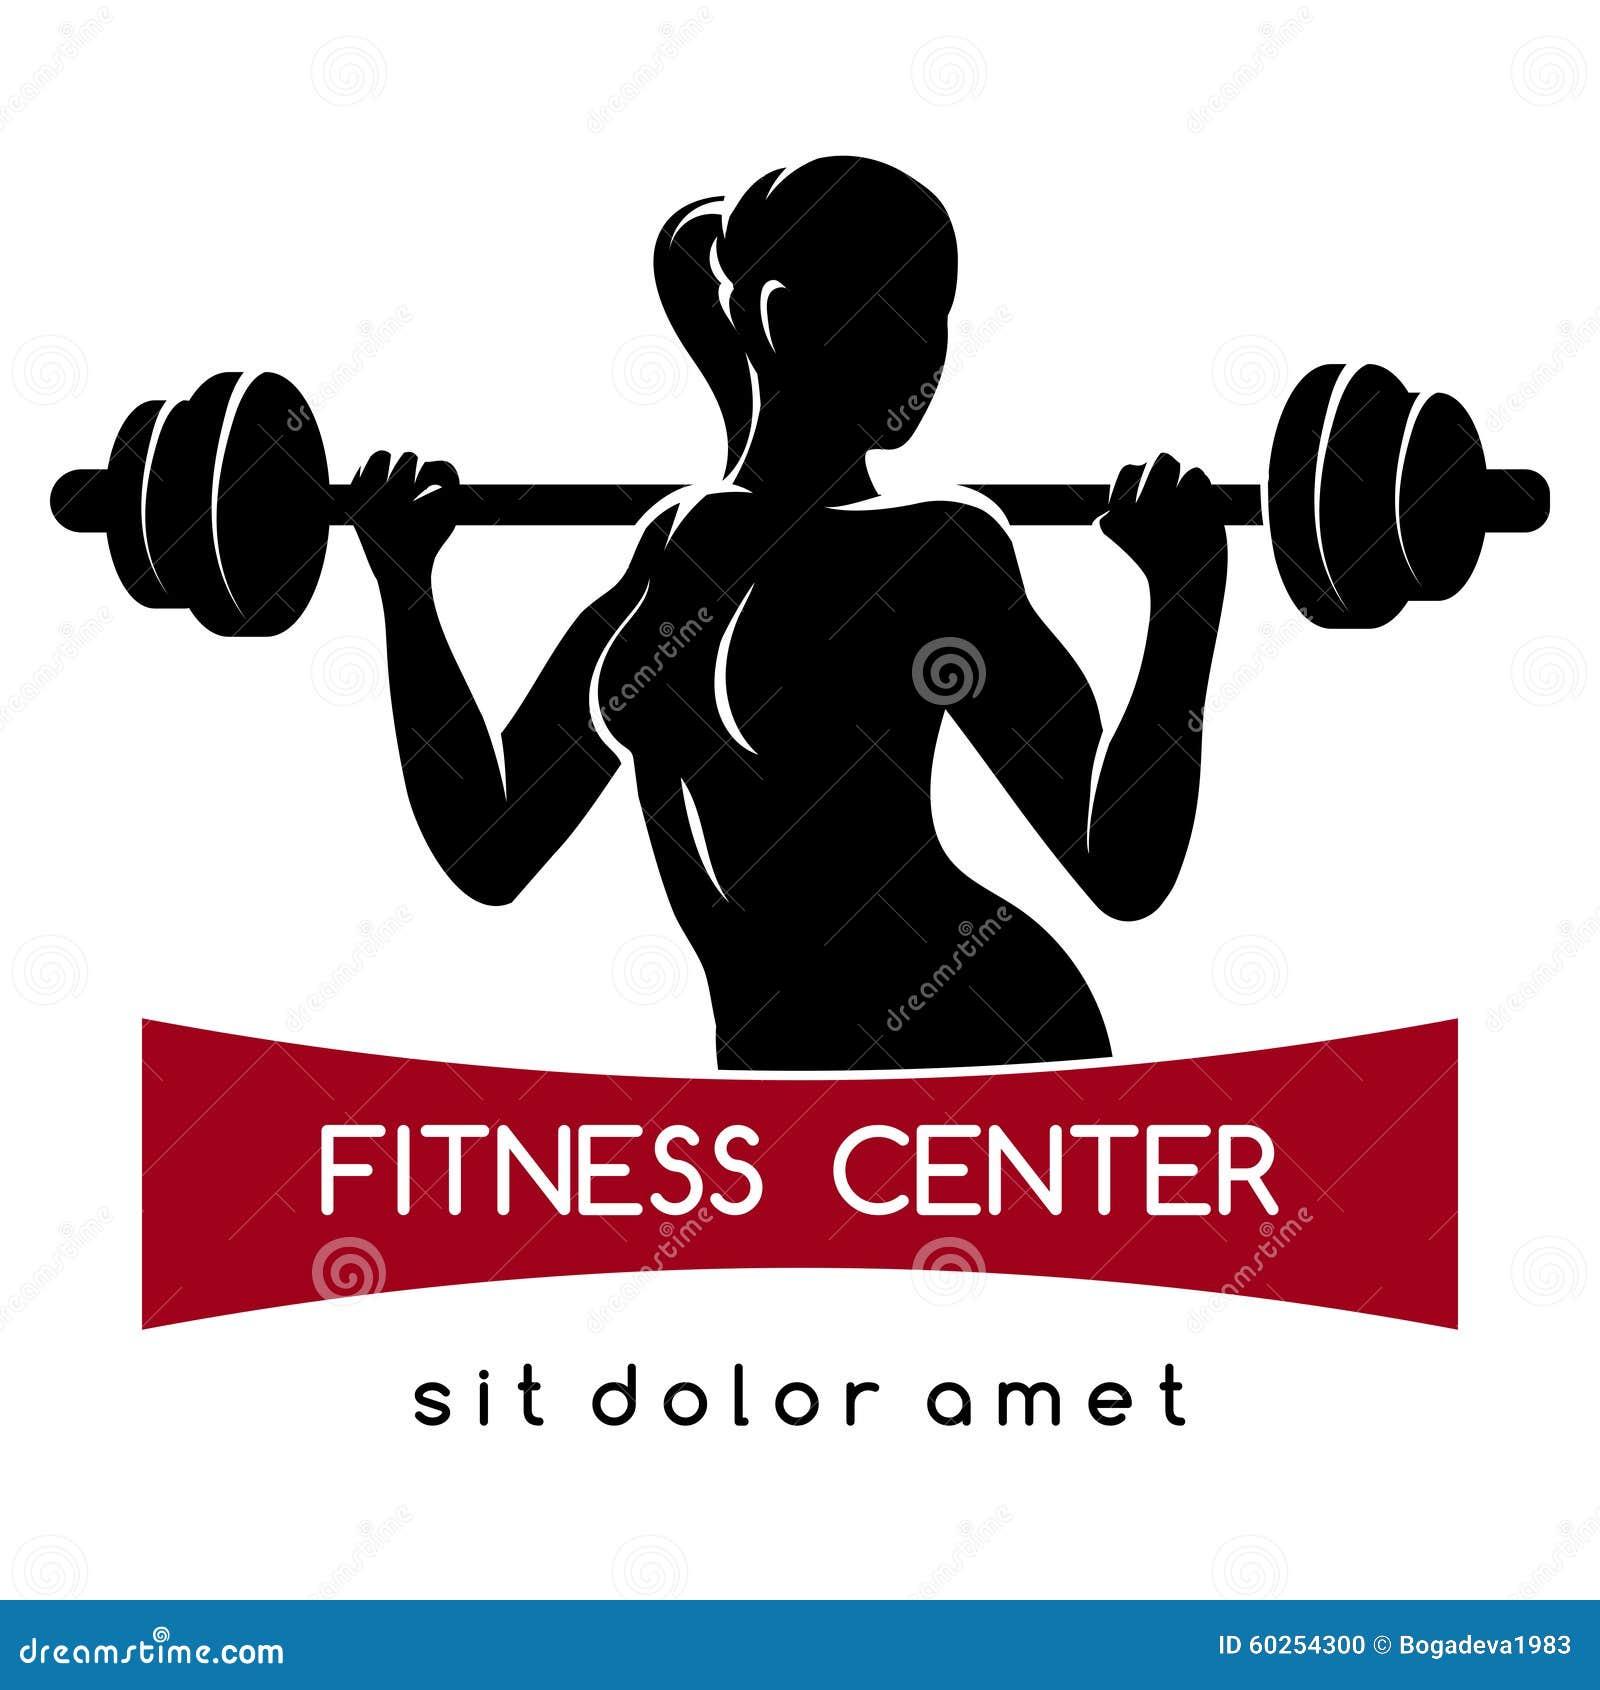 Fitness Center Or Gym Logo Stock Illustration - Image